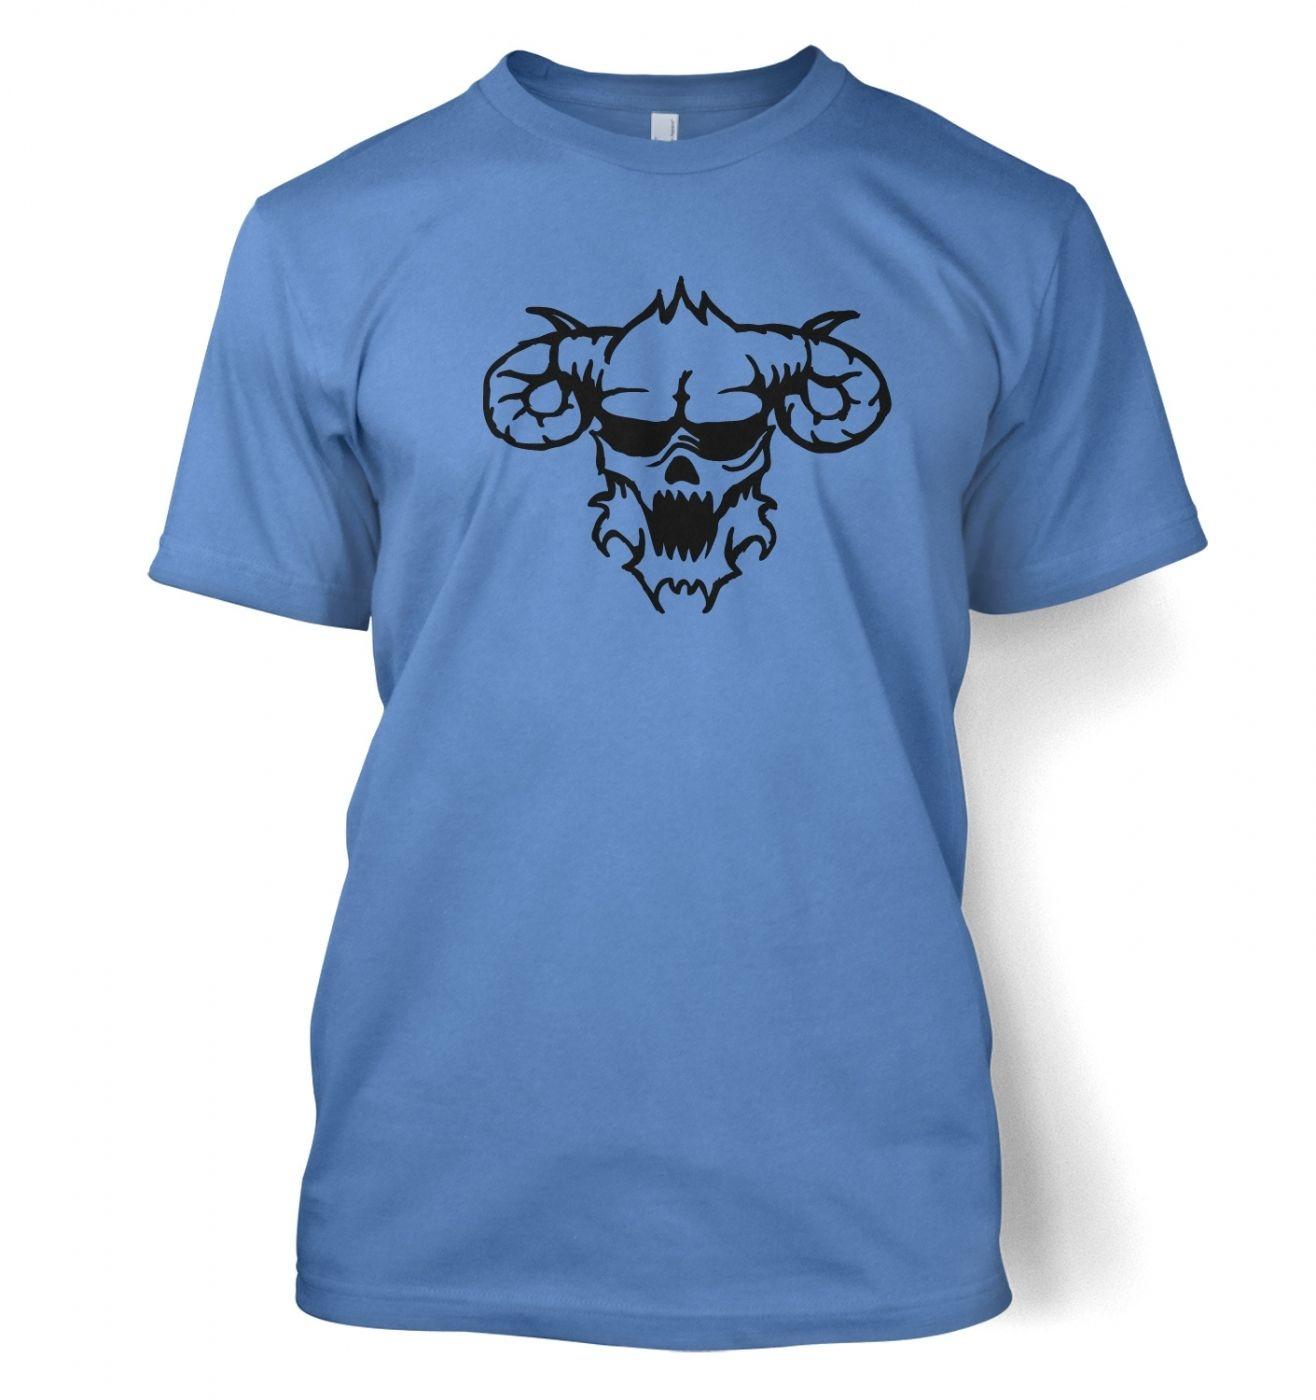 Black Outline Demon's Head men's t-shirt